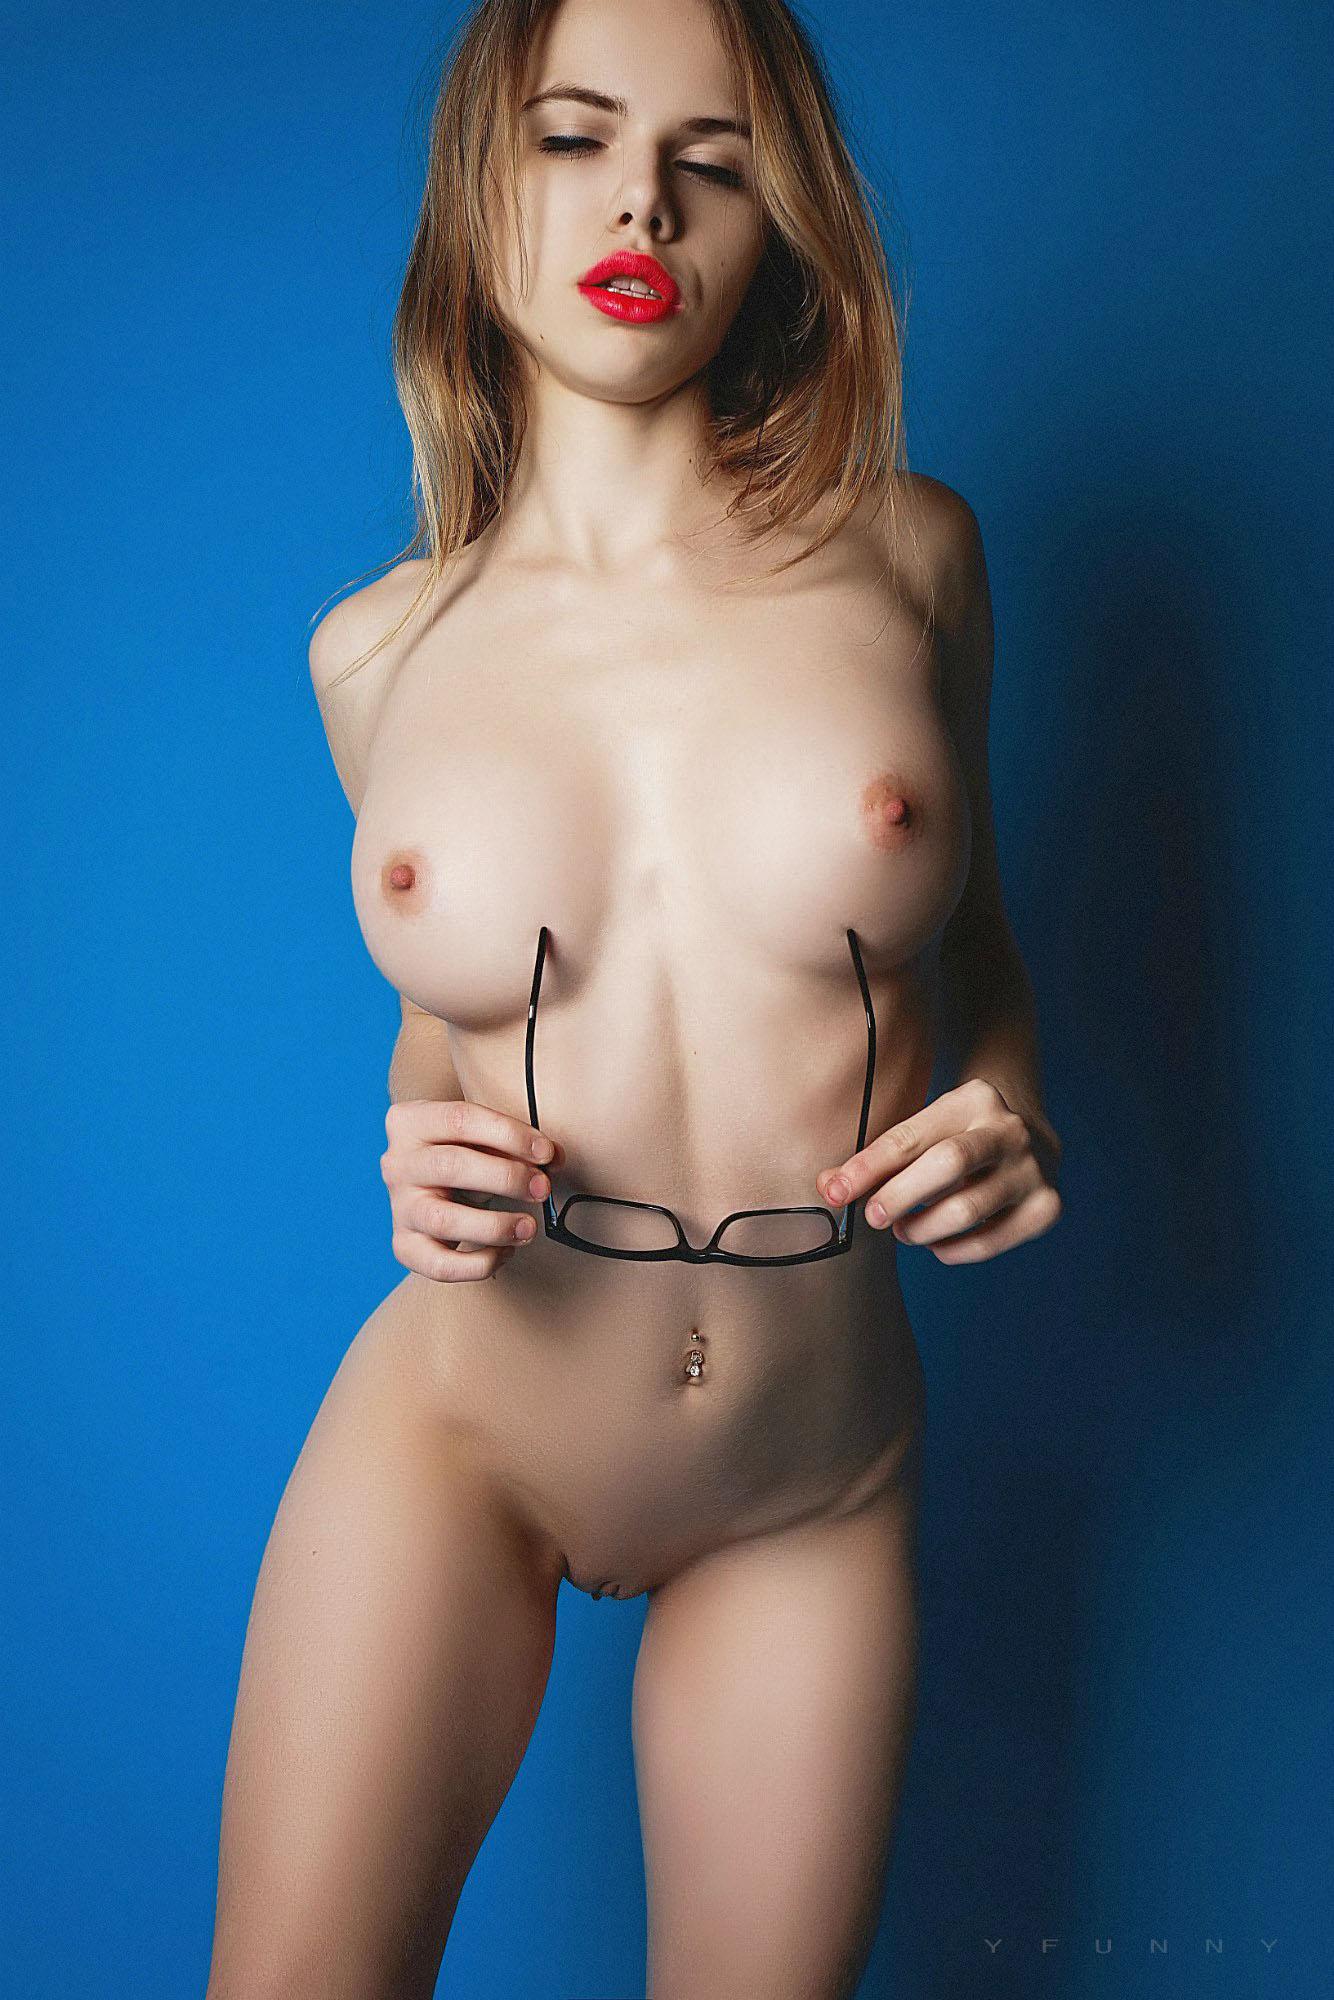 Agree, Celeb nude net will change